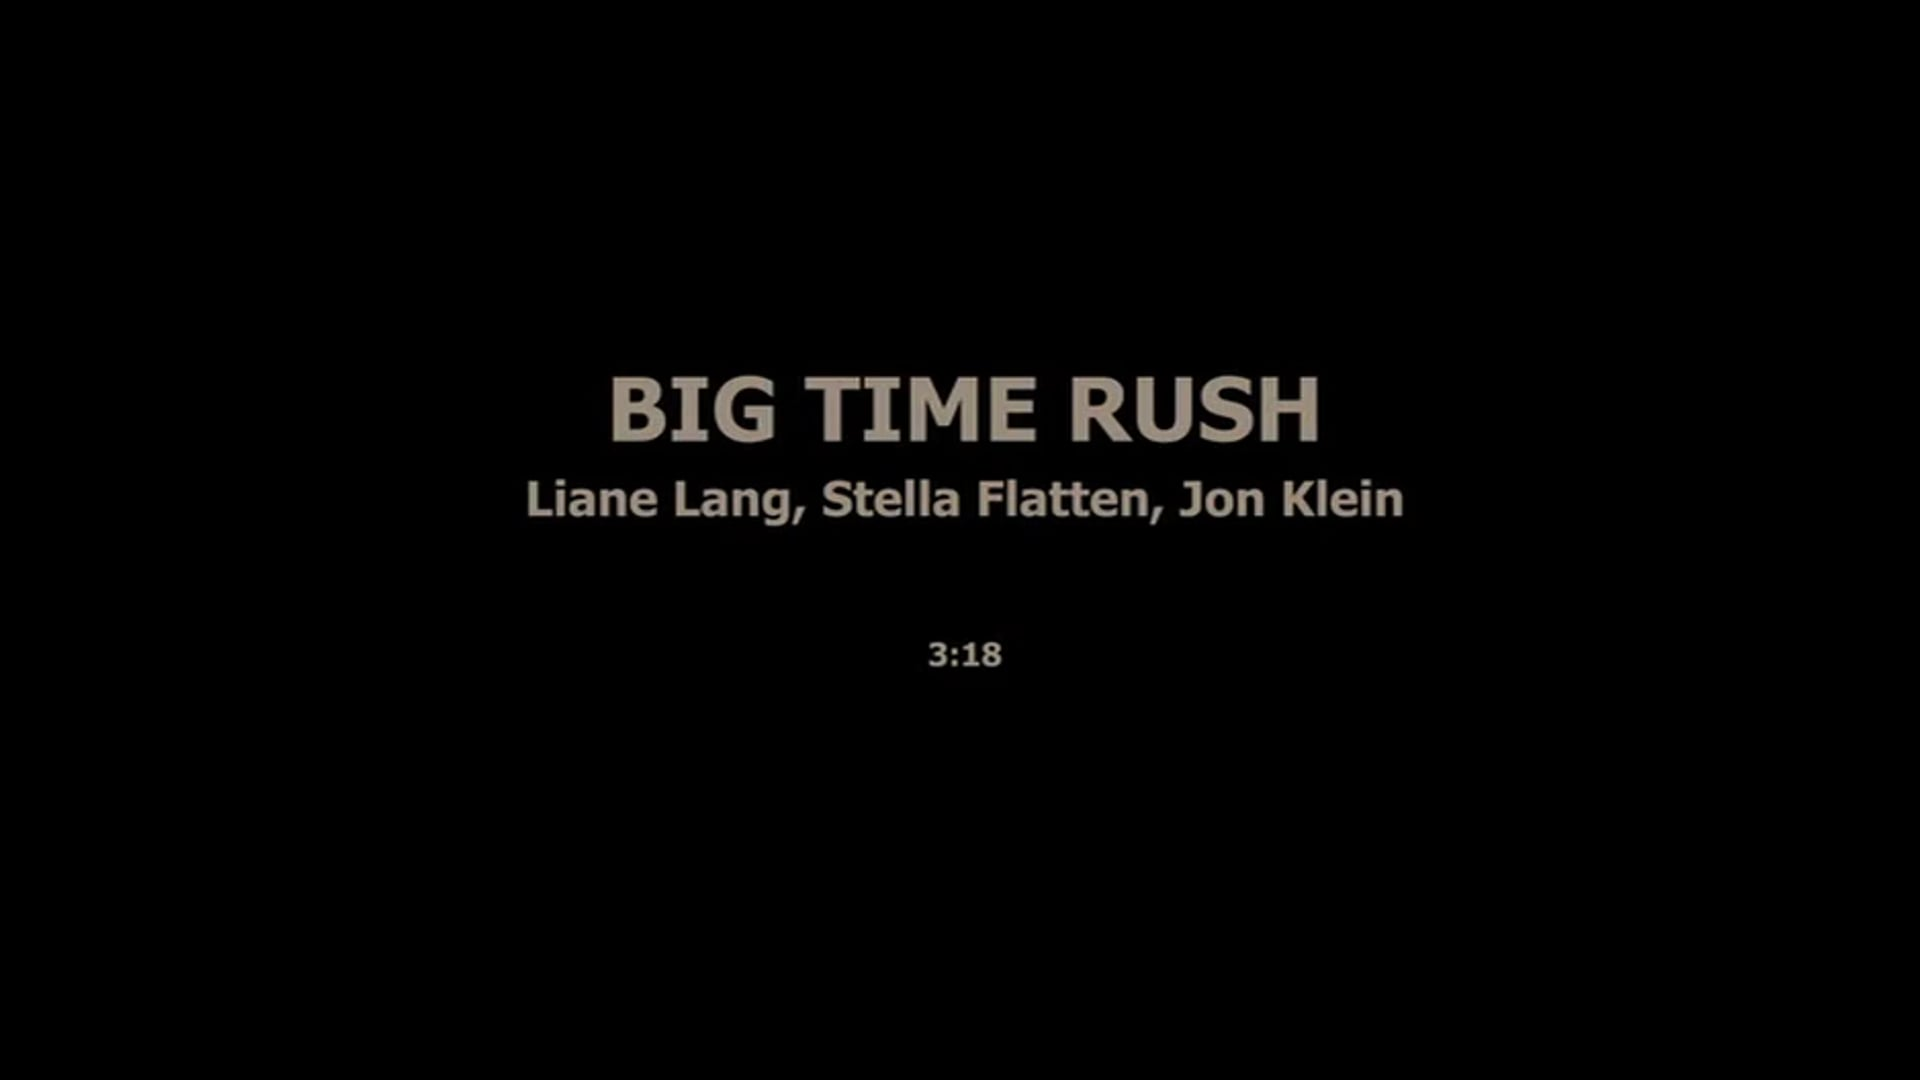 BIG TIME RUSH - LIANE LANG, STELLA FLATTEN, JON KLEIN